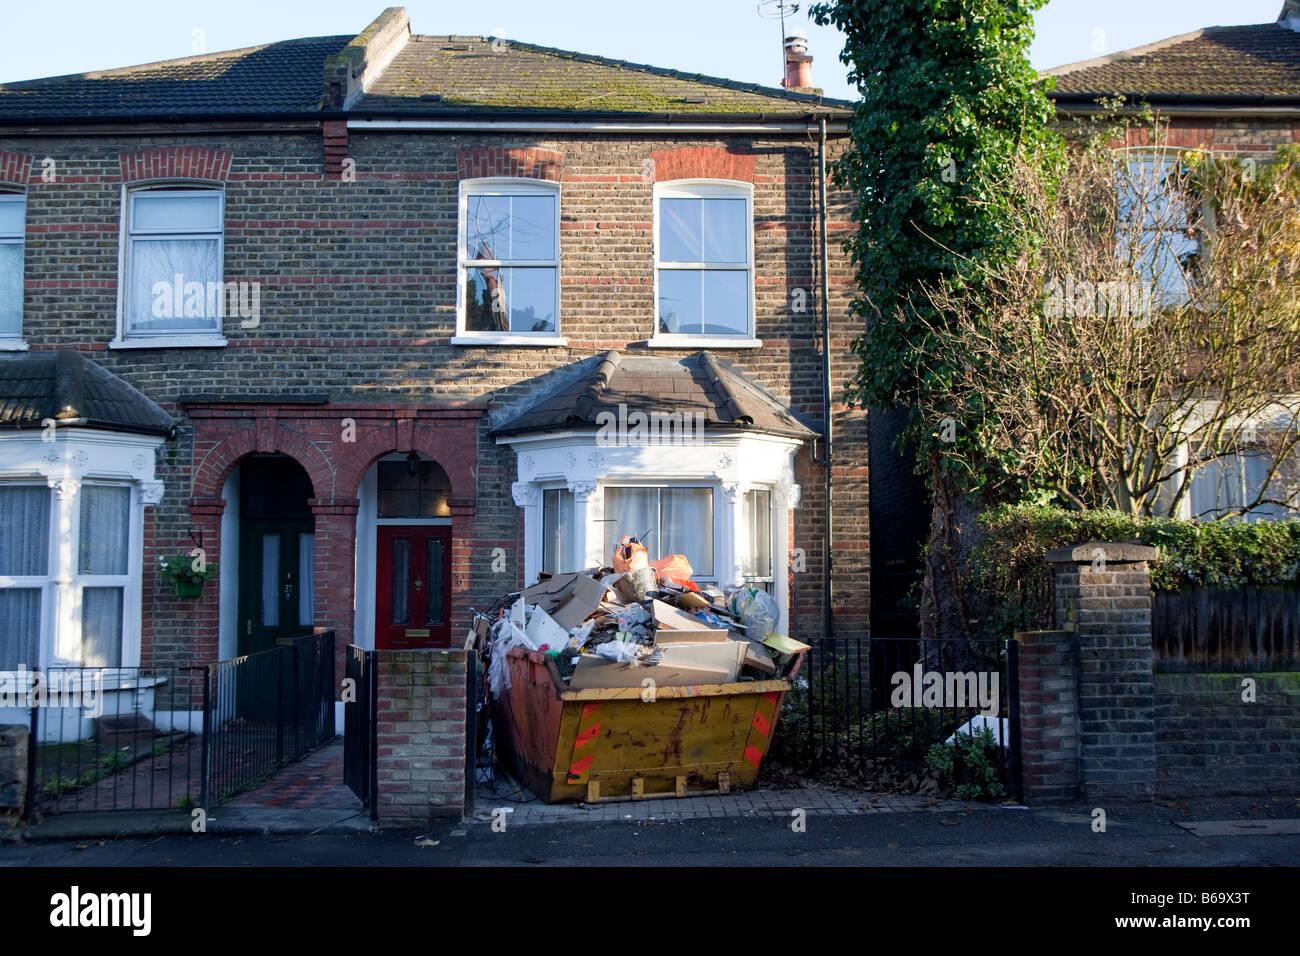 skip outside edwardian victorian semi detached terrace house - Stock Image